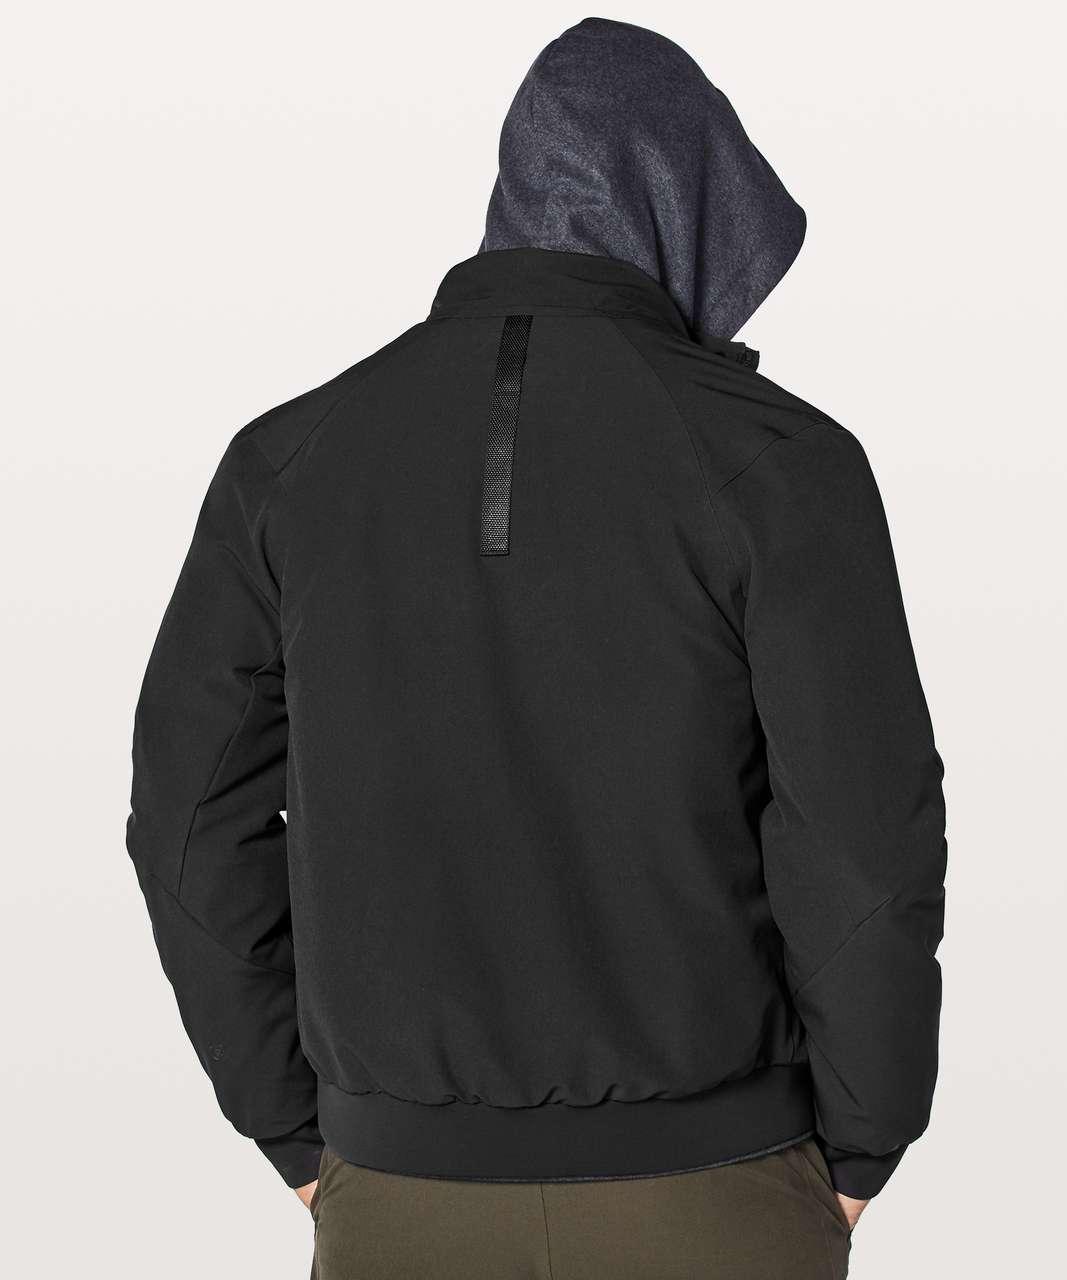 Lululemon lululemon x Roden Gray Bomber Jacket - Black